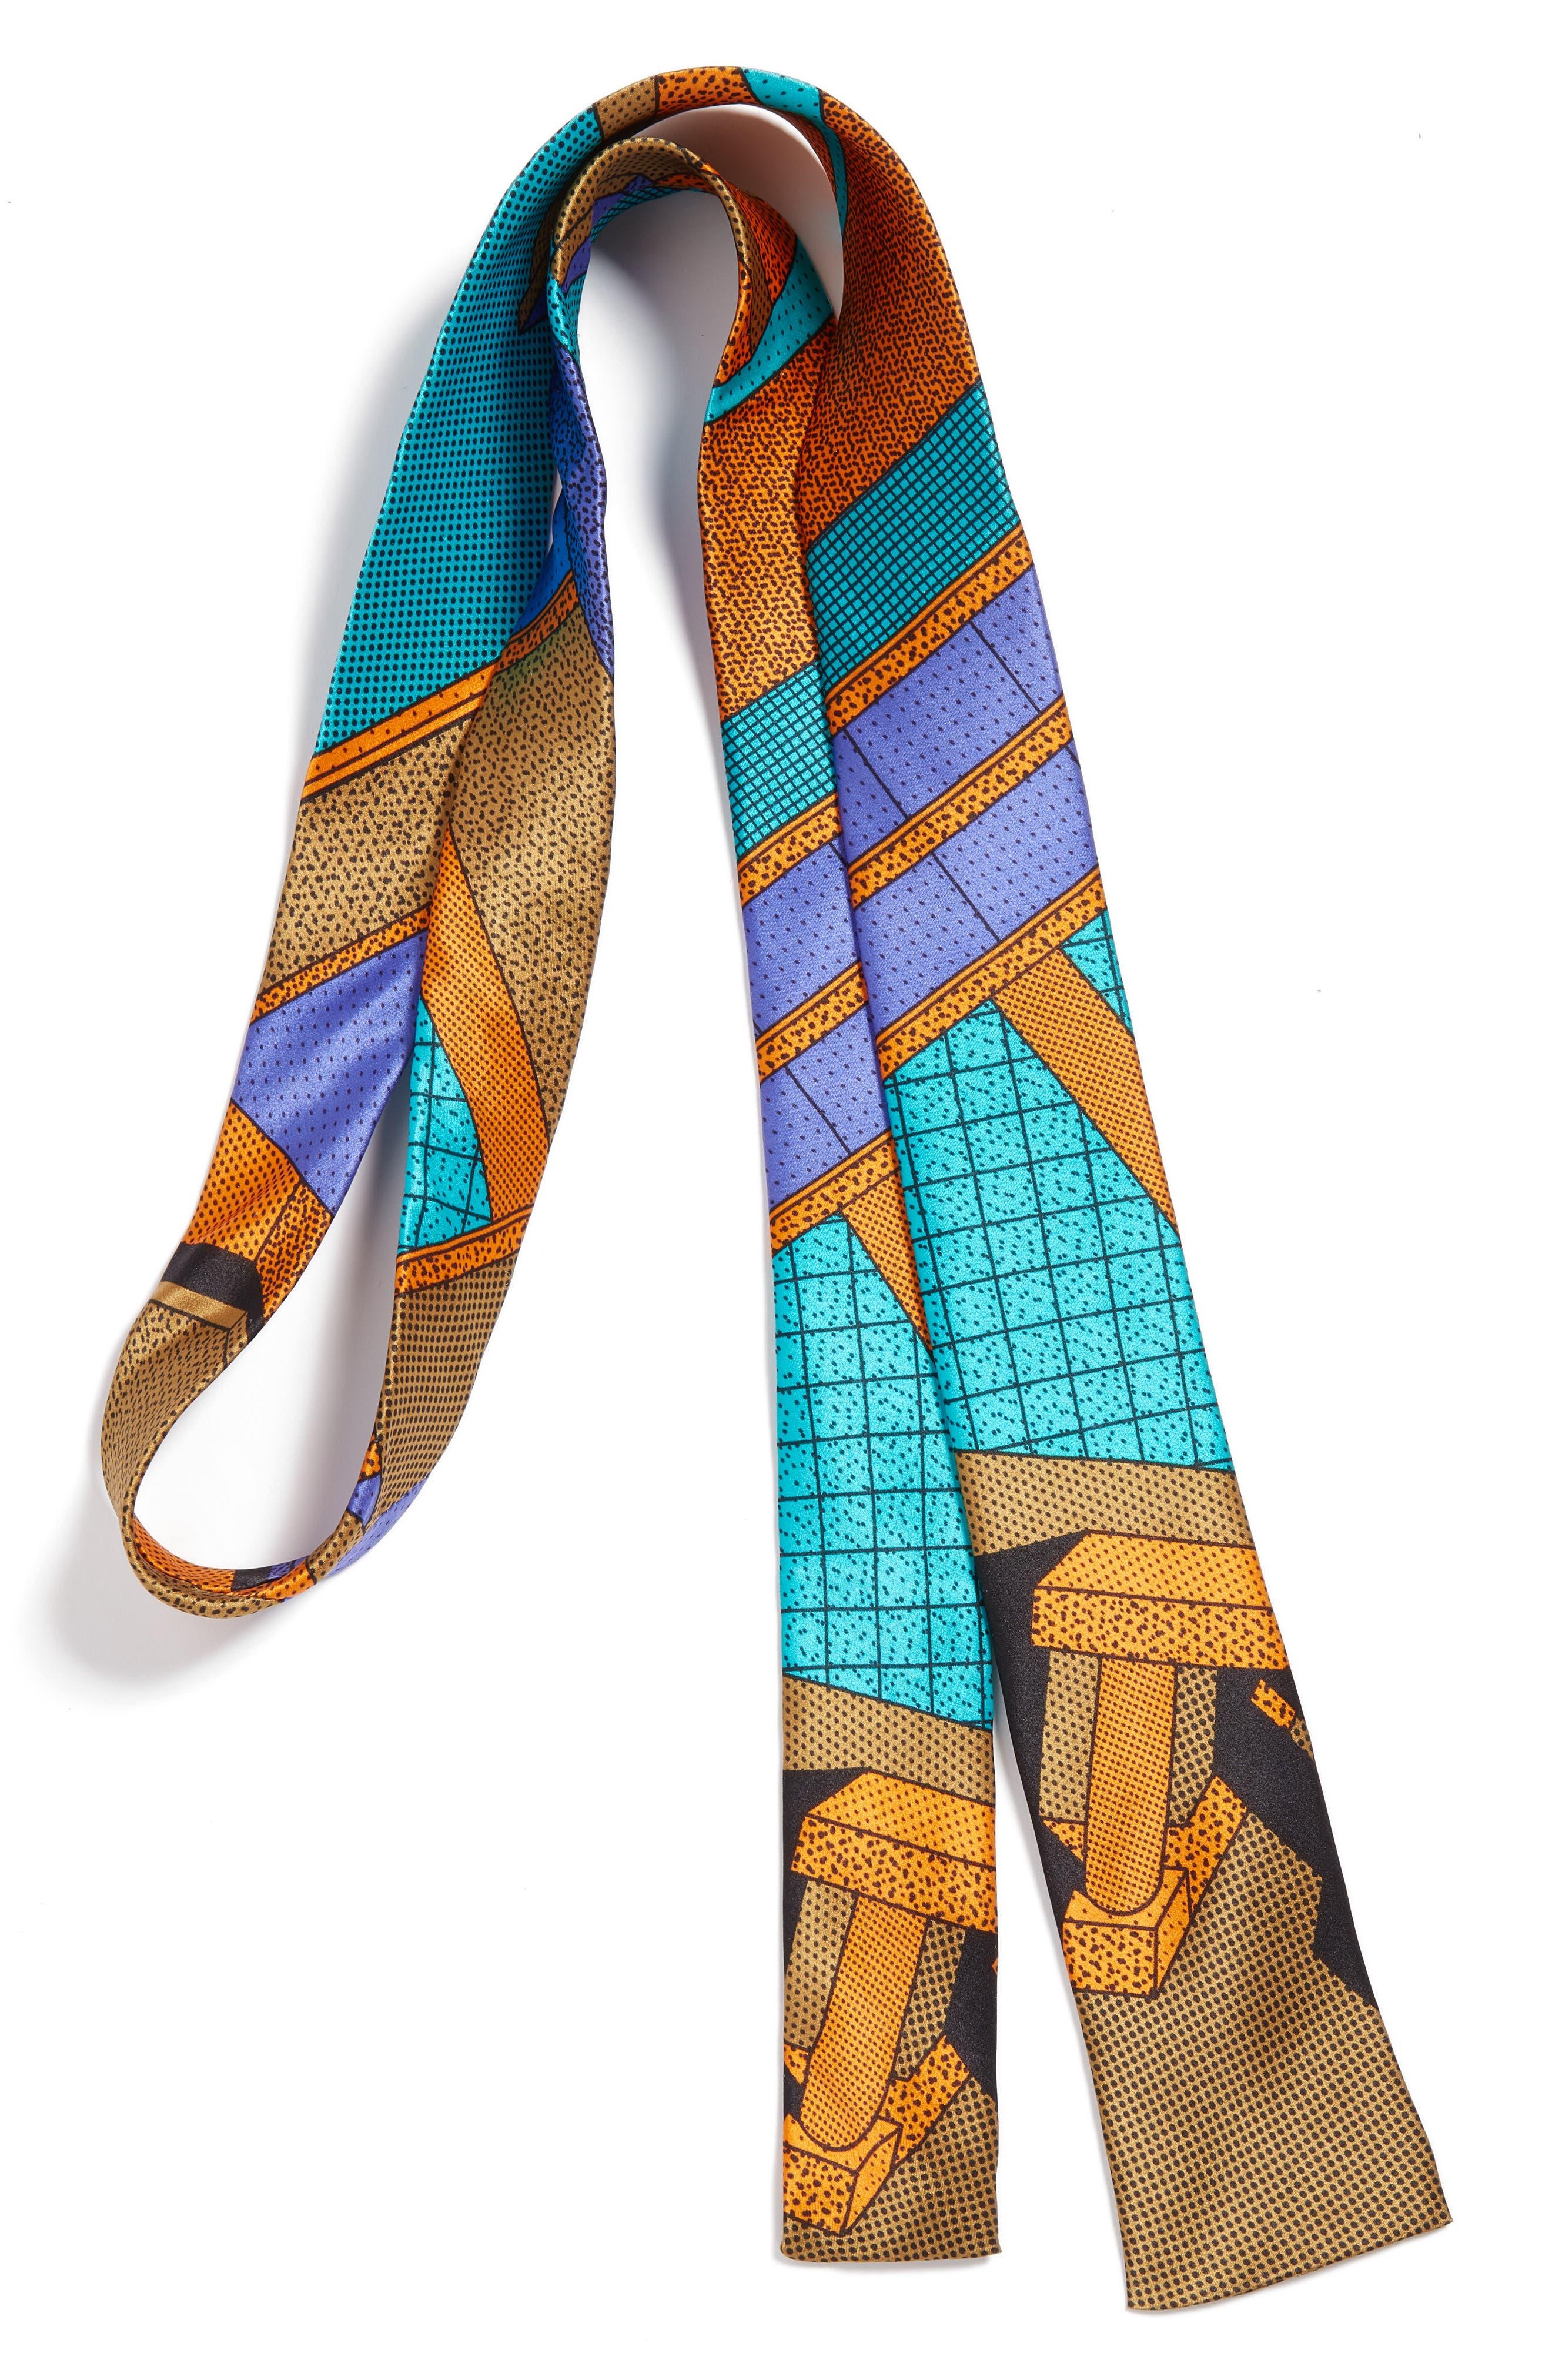 MEMPHIS Milano Teal/Orange Print Silk Tie,                             Main thumbnail 1, color,                             440